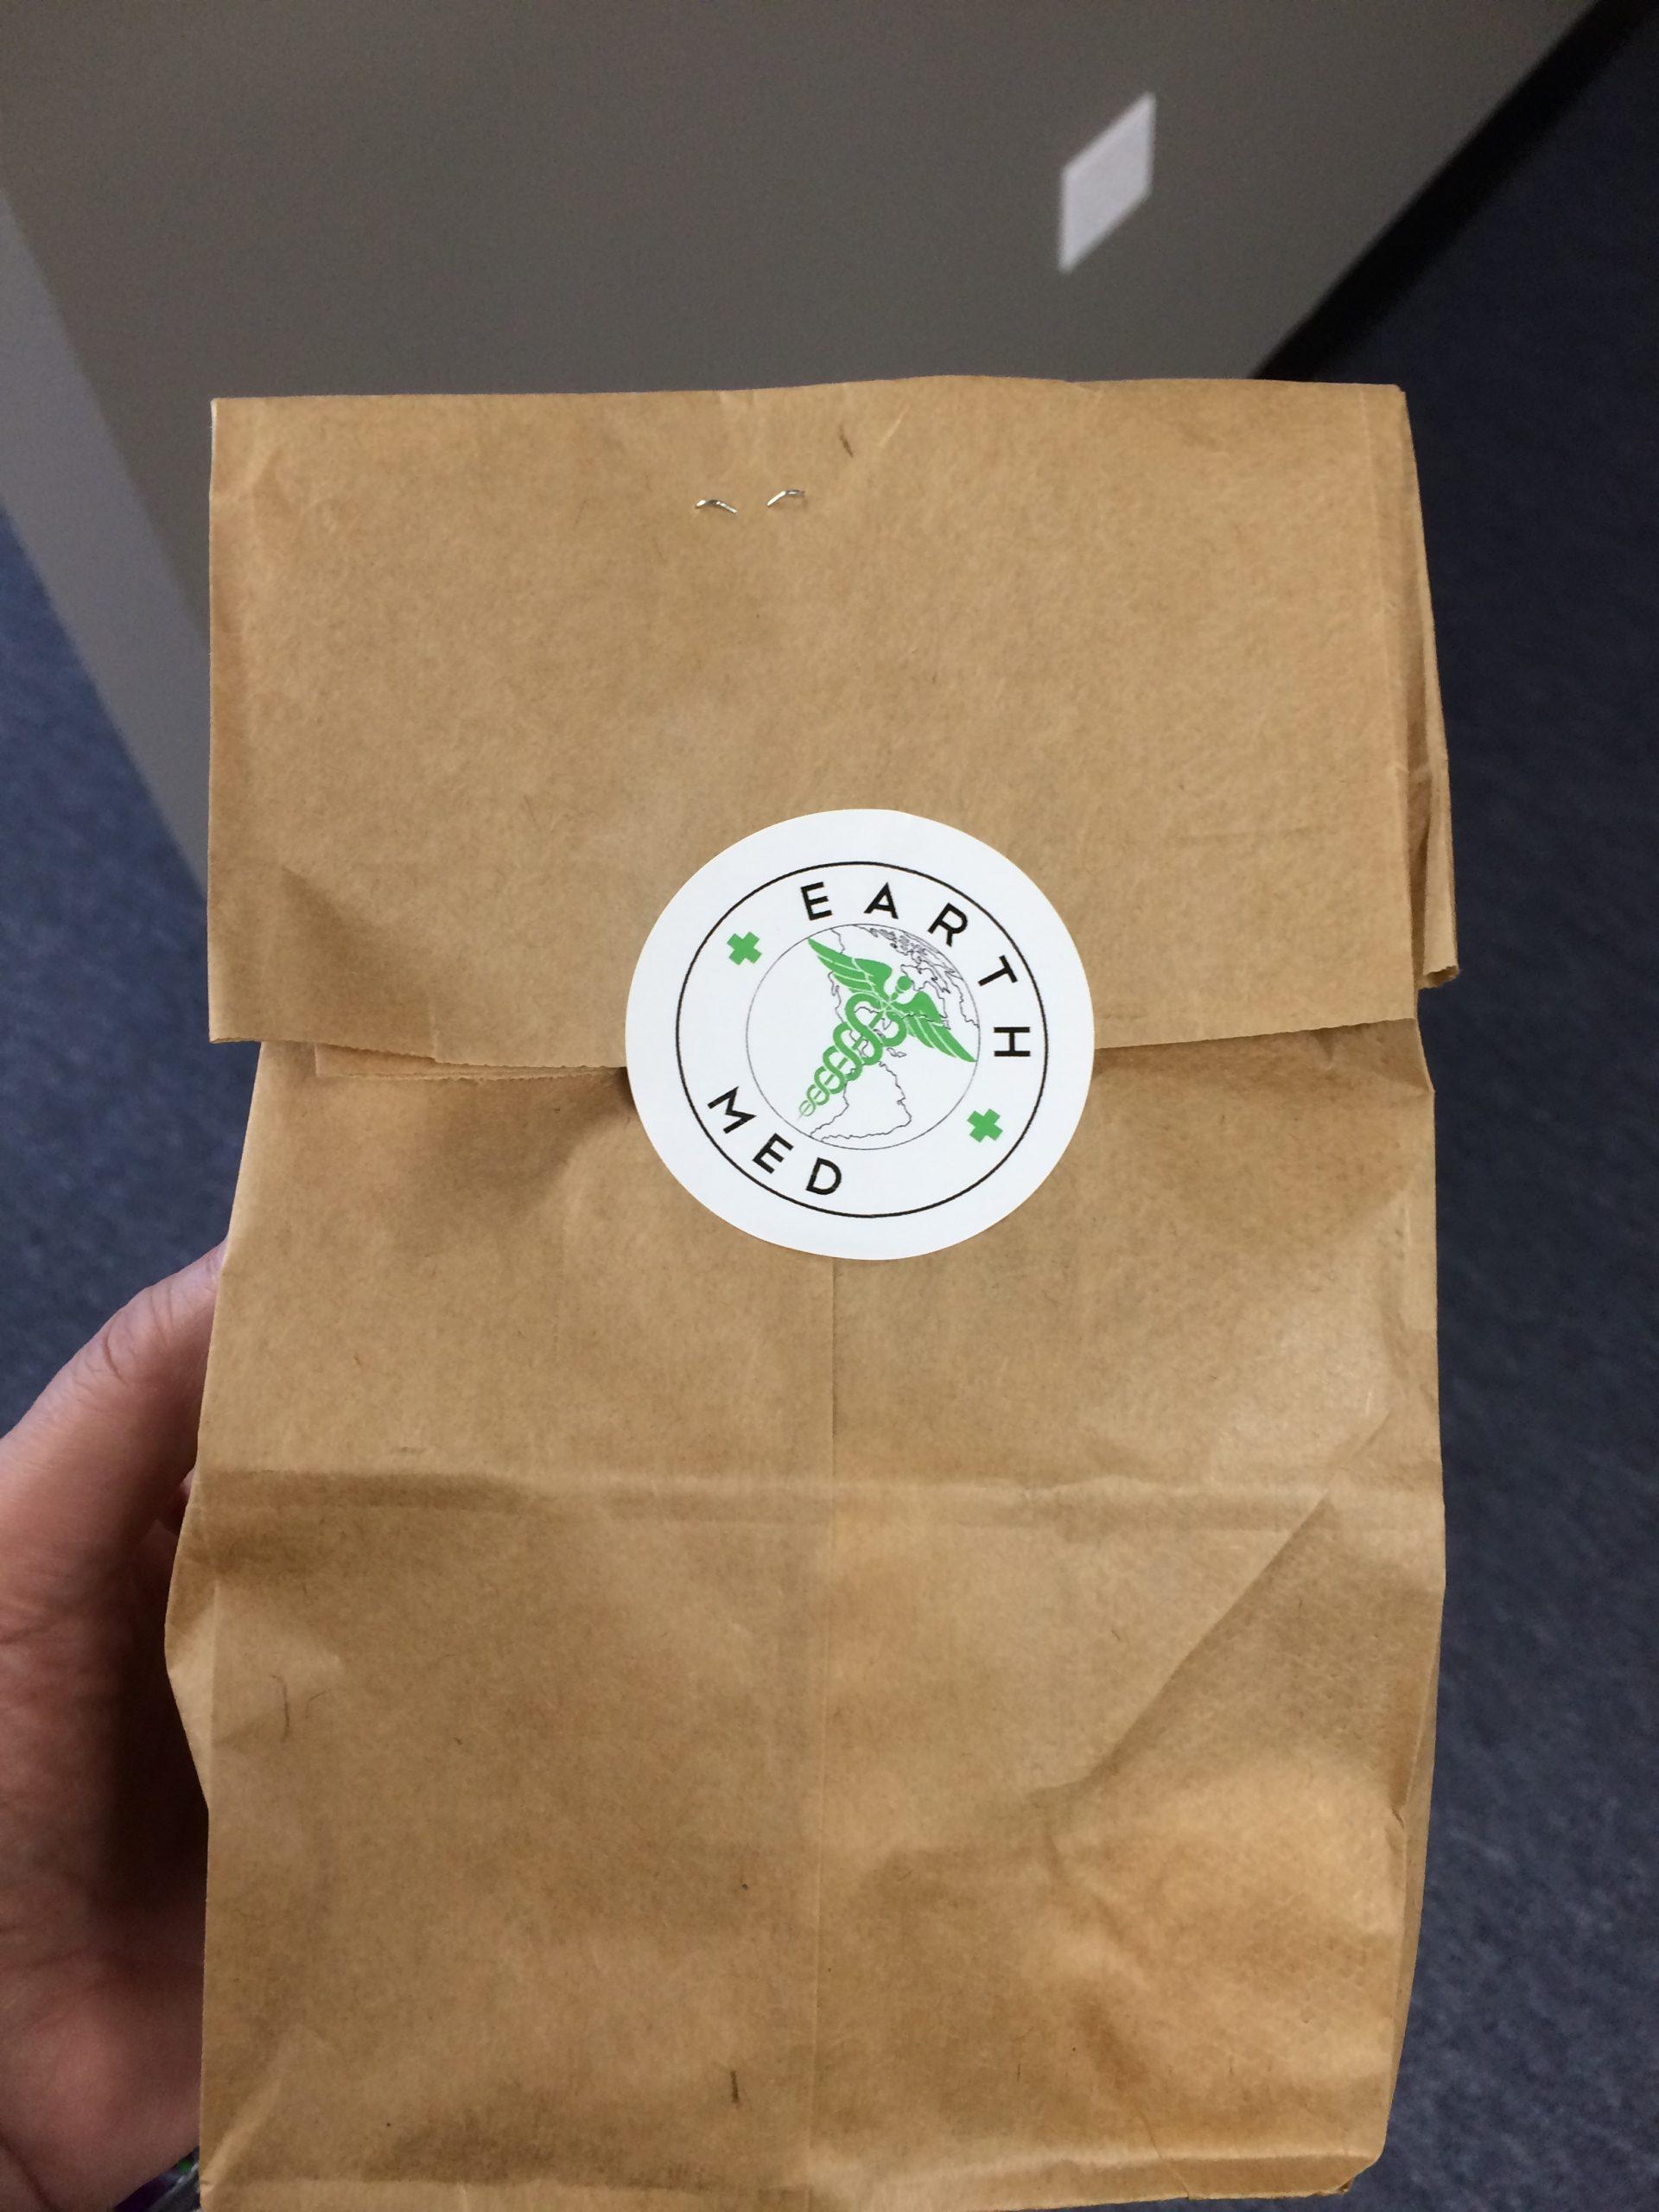 A not so little green bag from EarthMed